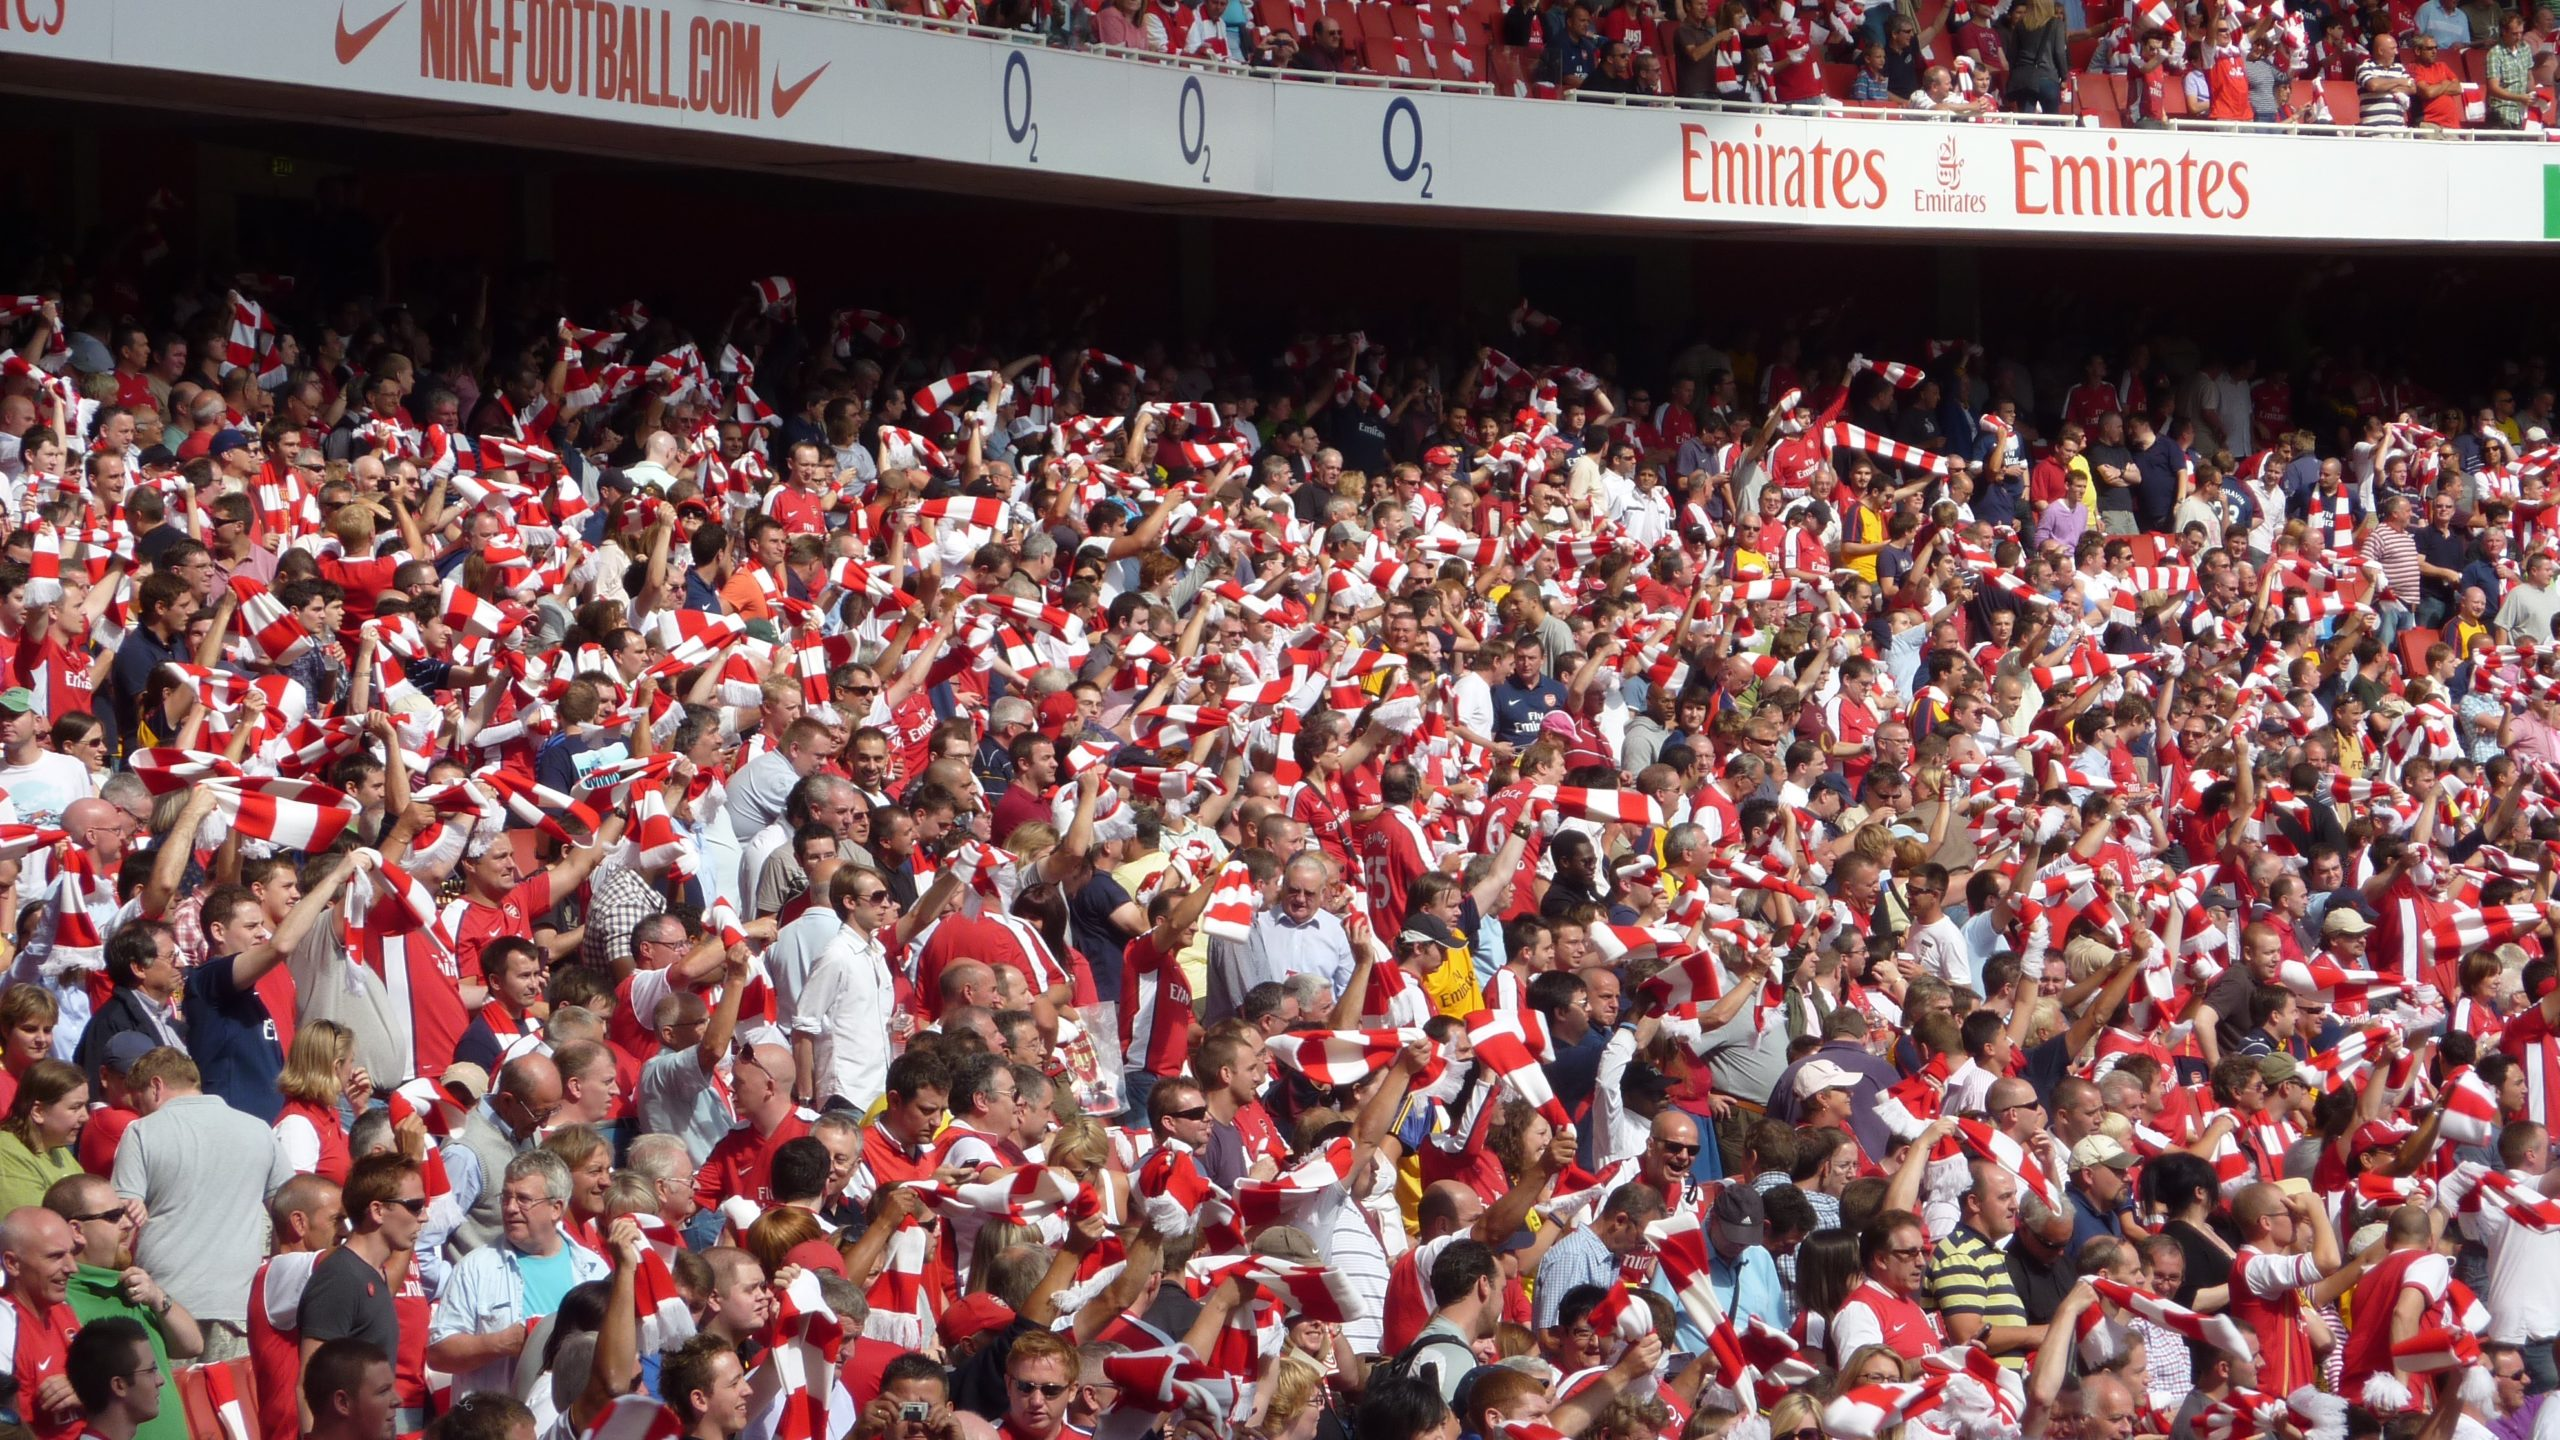 arsena supporters, gooners in the stadium